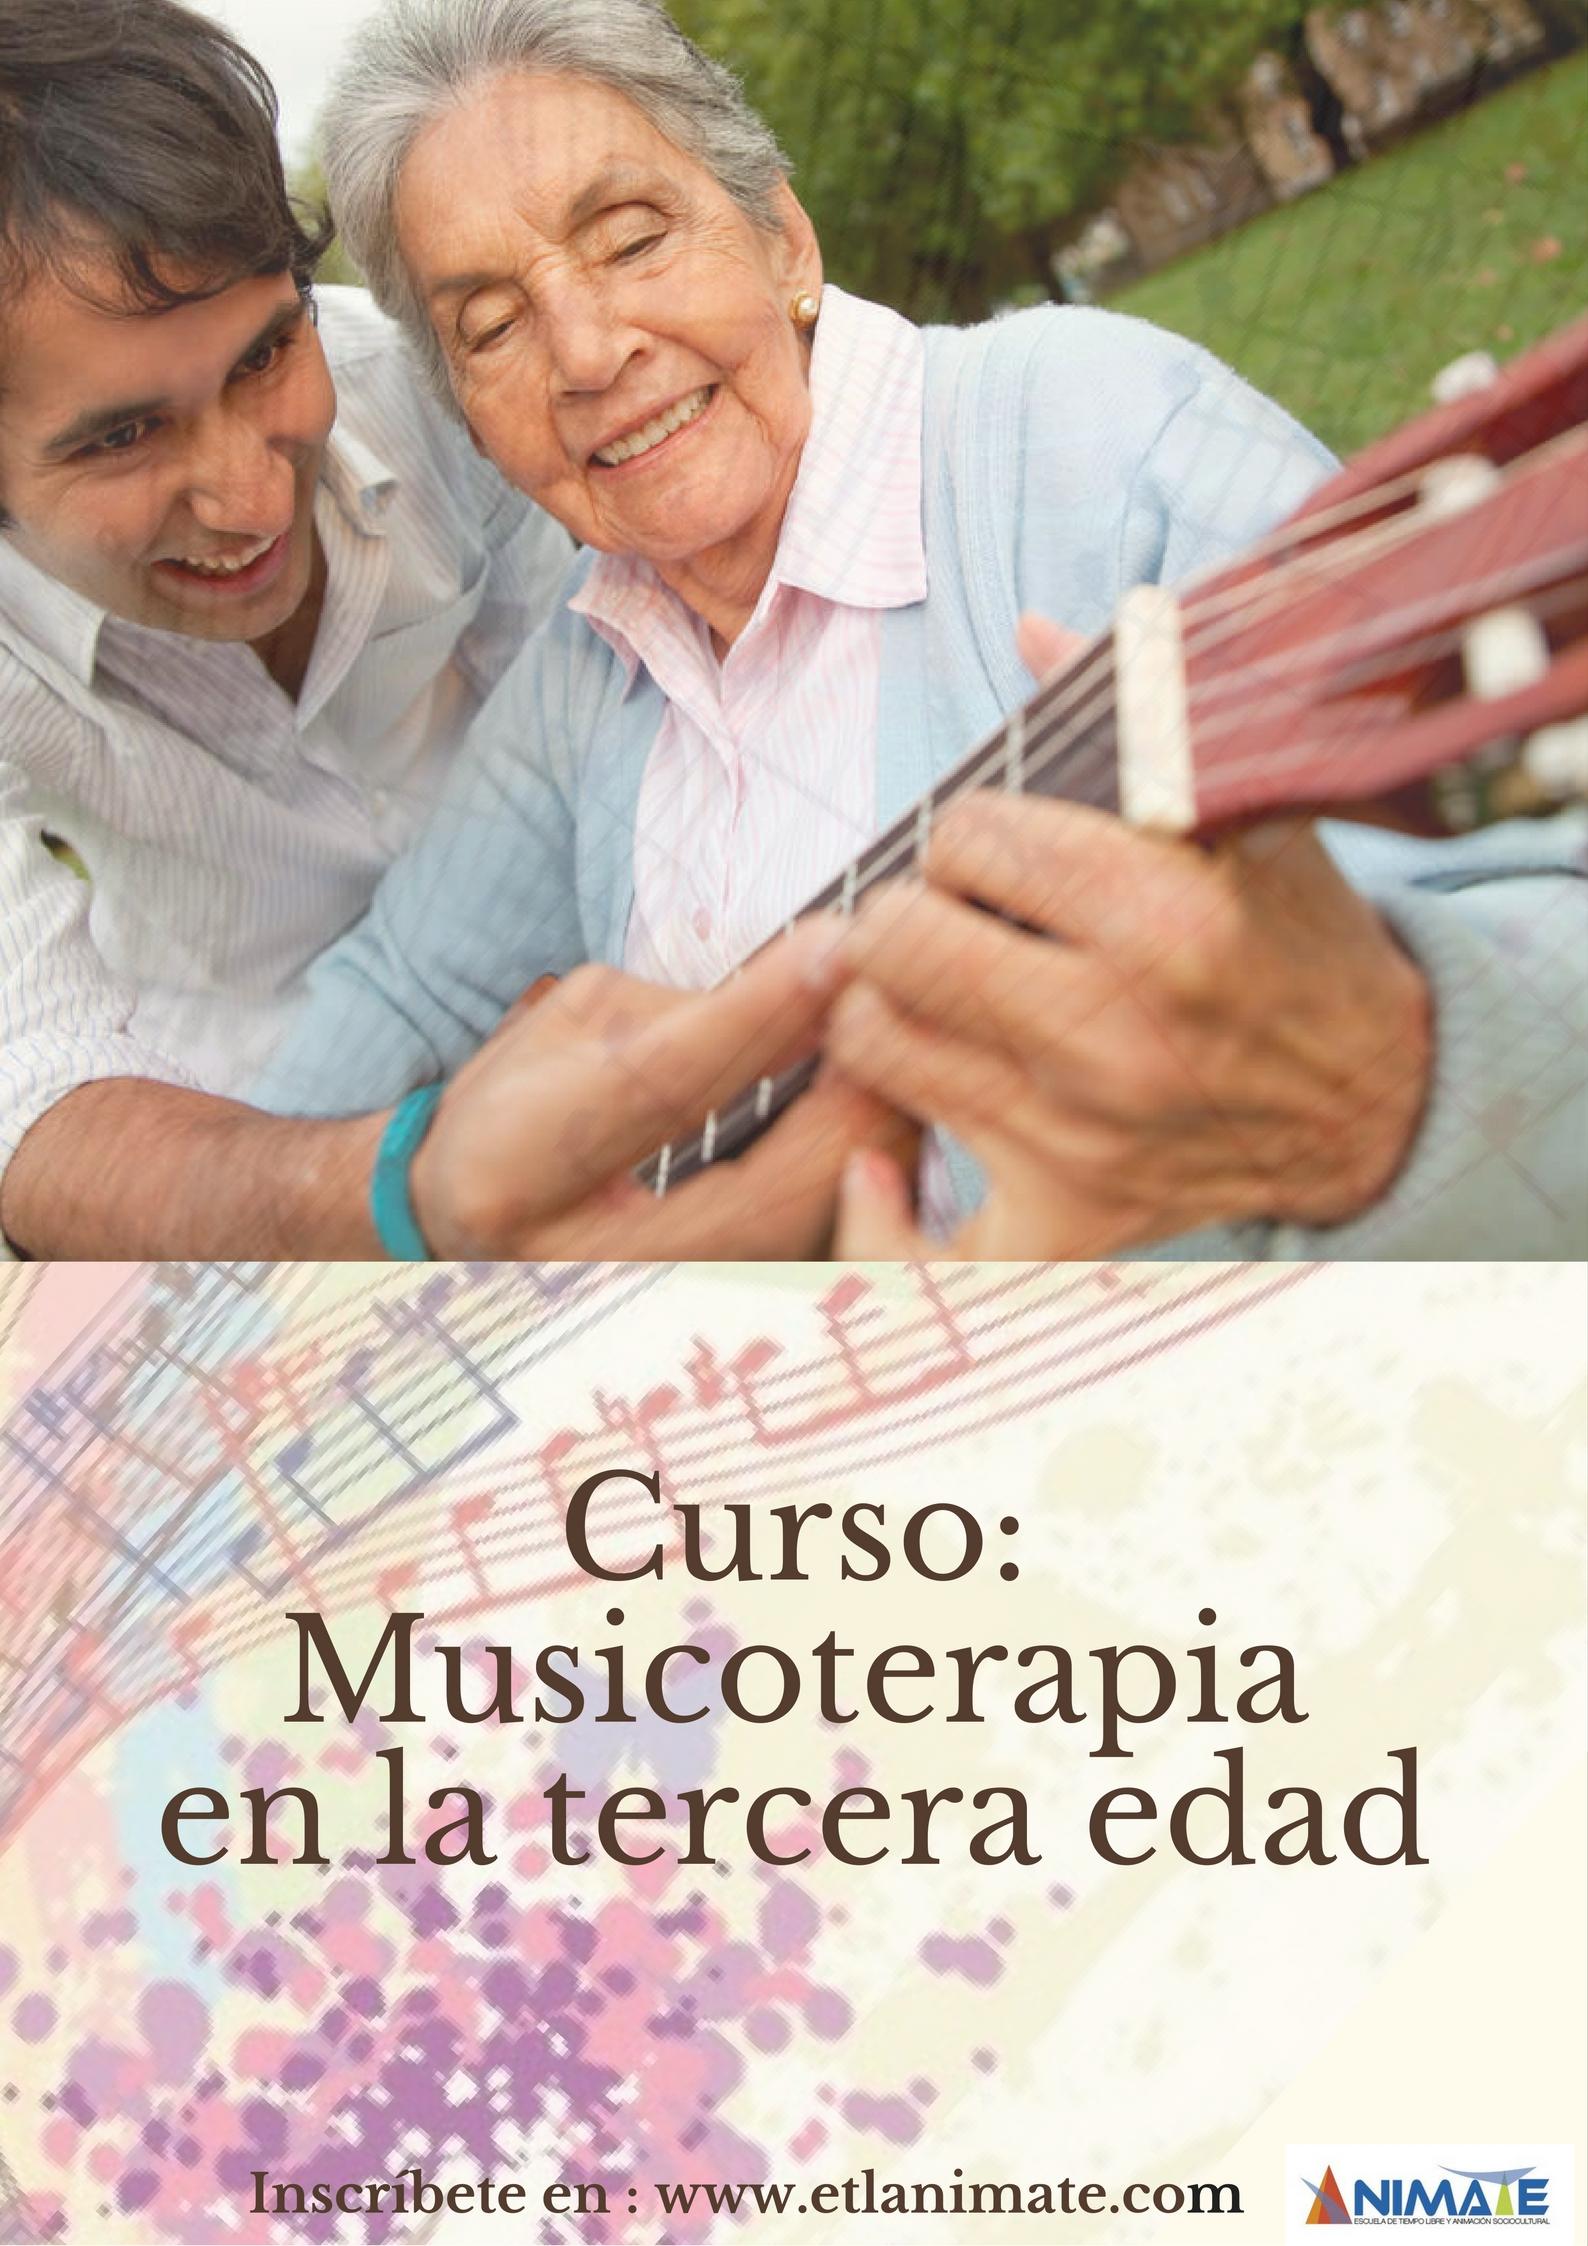 musicoterapia-en-la-tercera-edad